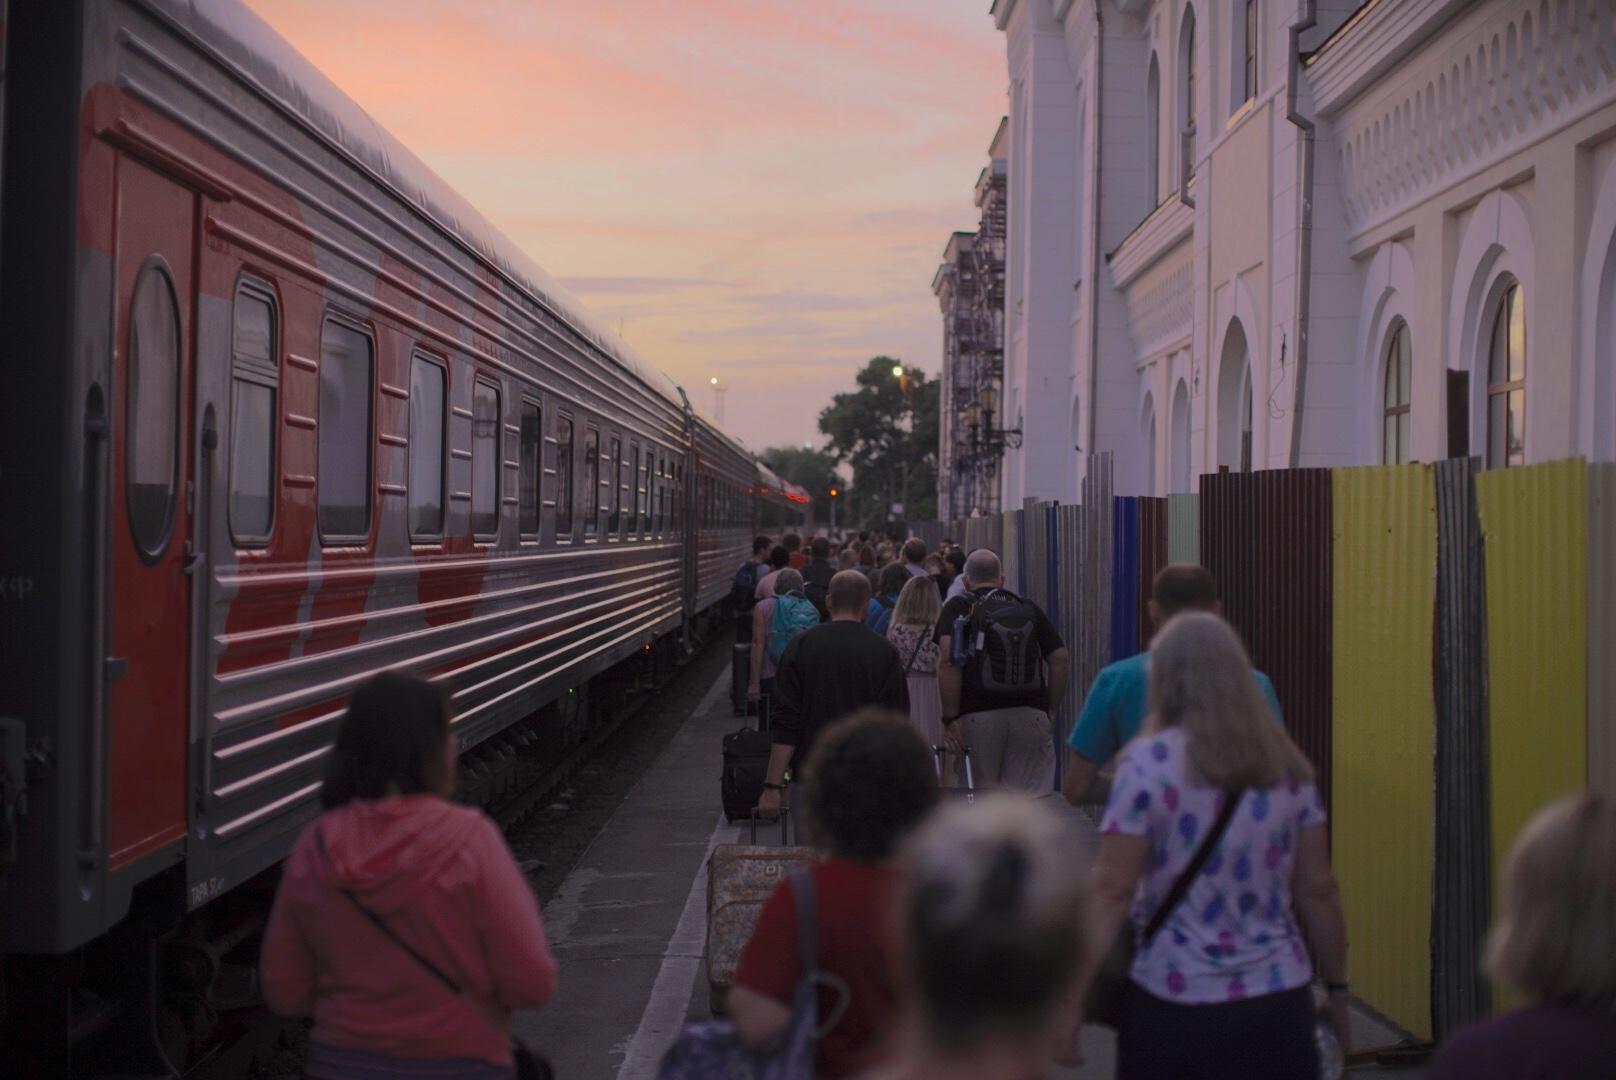 Boarding the train in Tambov on Monday evening